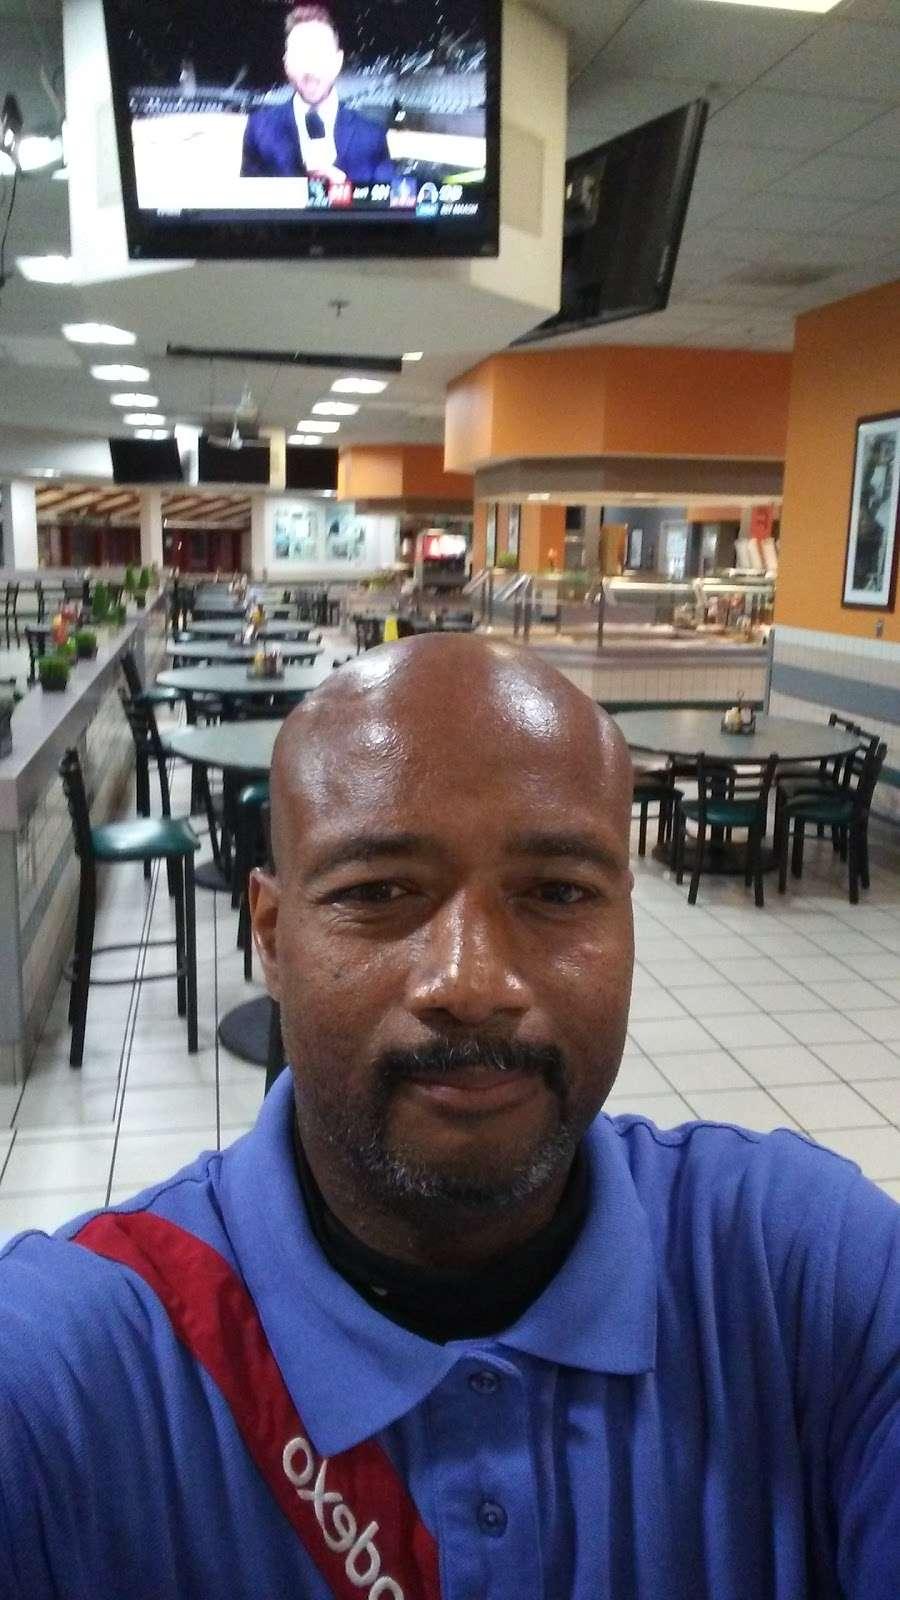 24 Area Messhall - restaurant  | Photo 2 of 8 | Address: Oceanside, CA 92058, USA